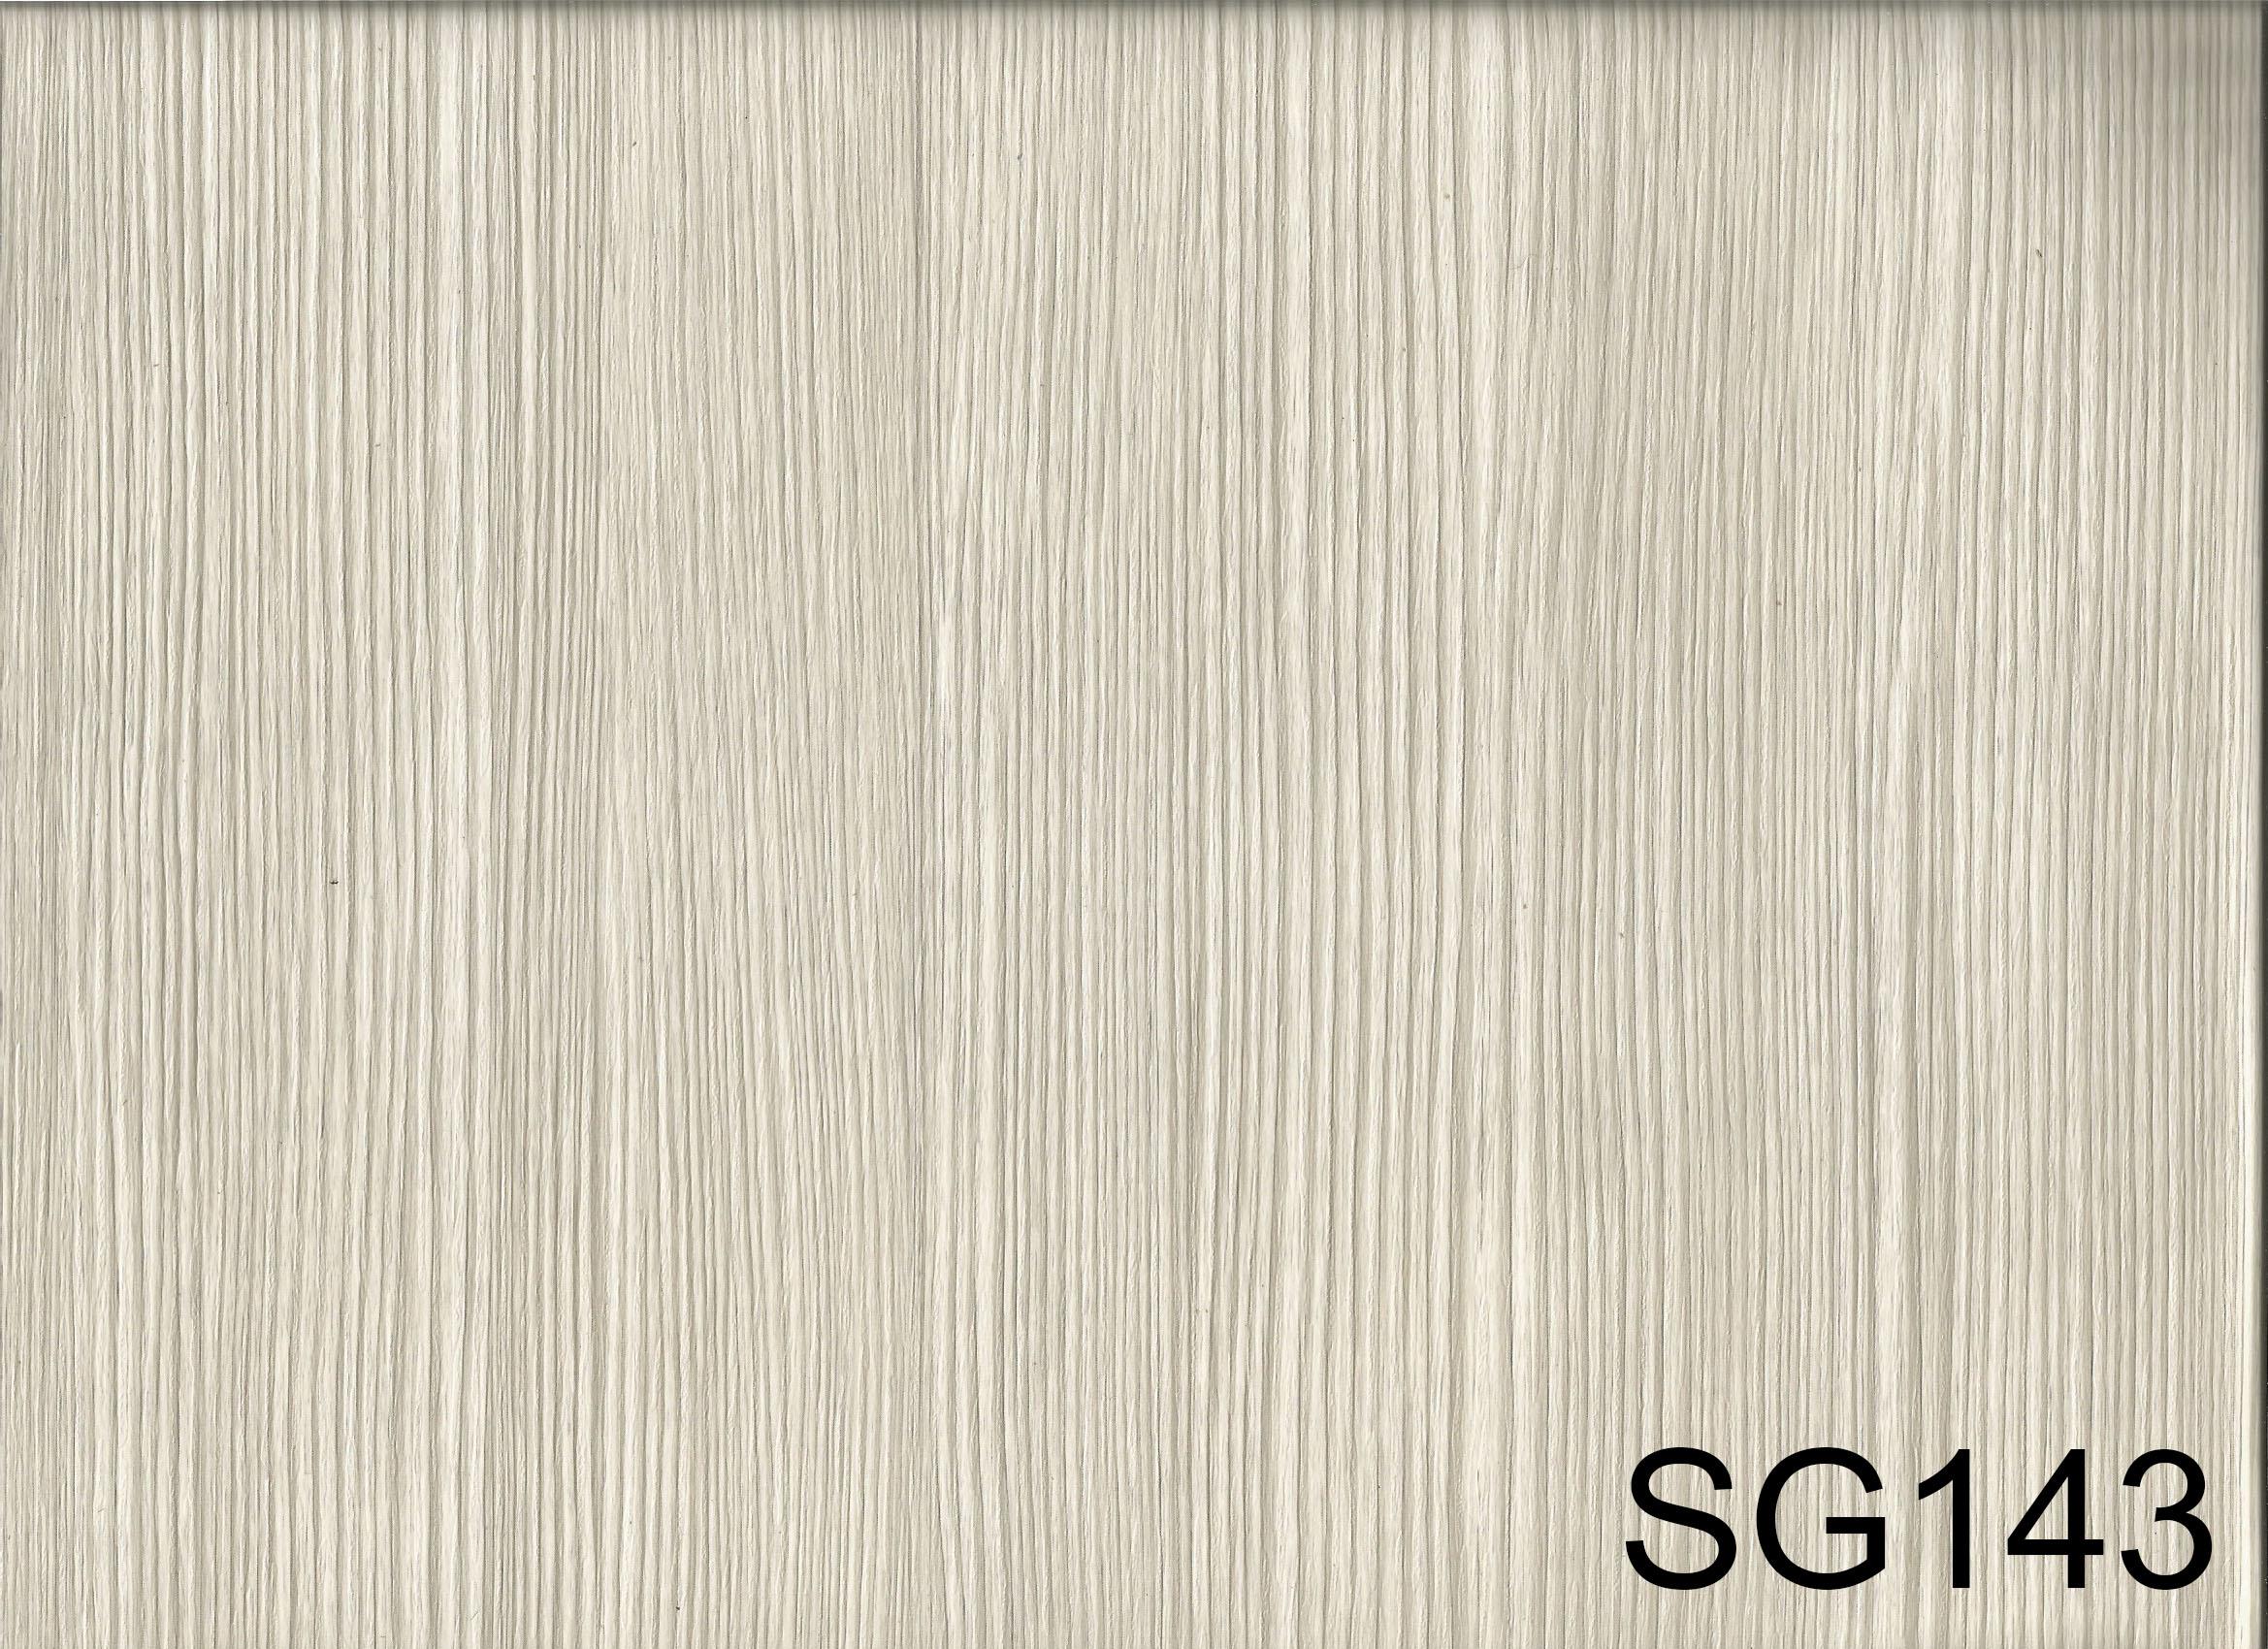 SG143